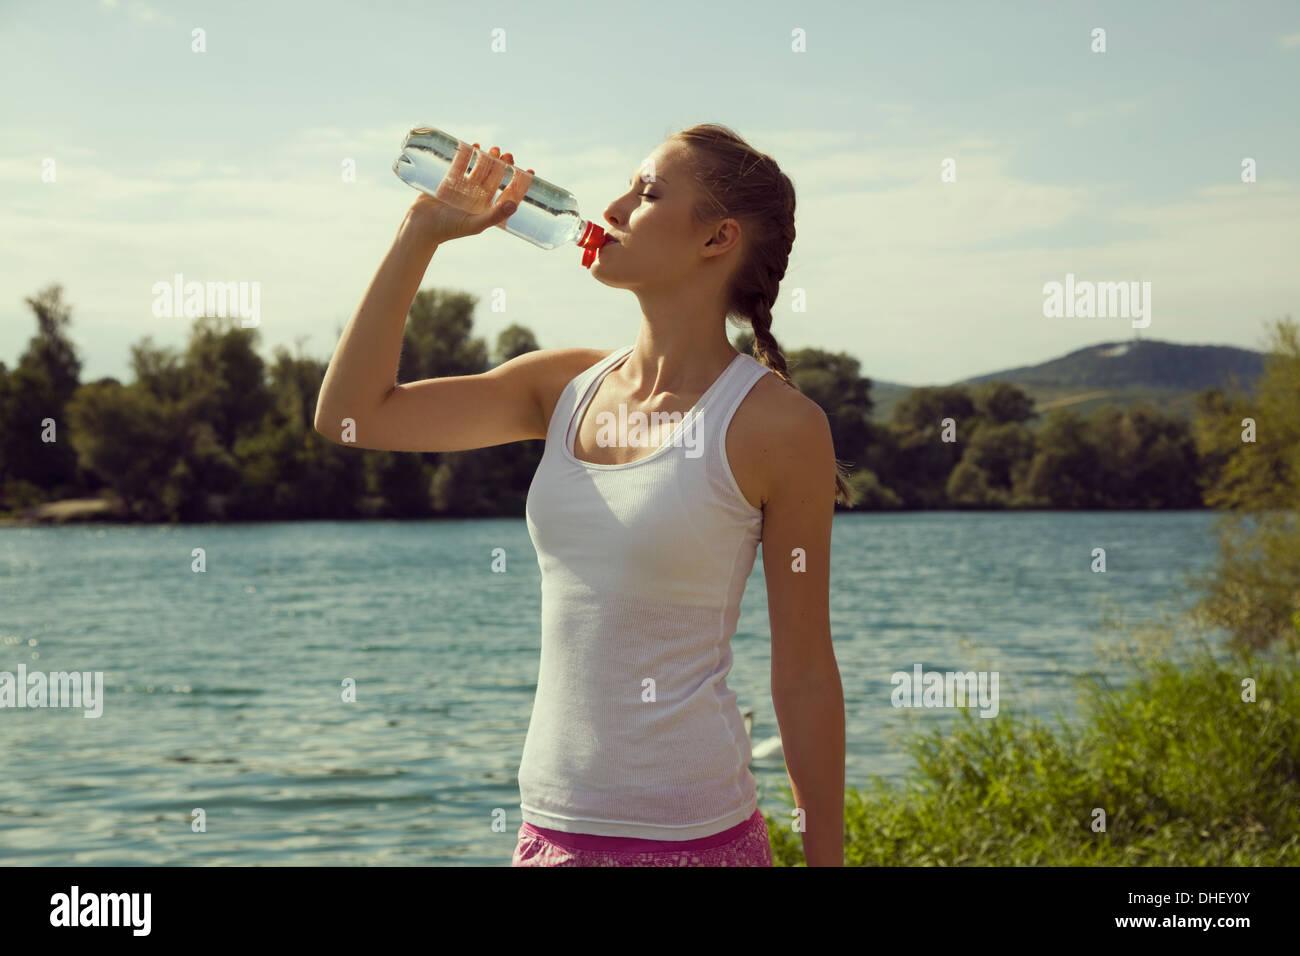 Emparejador de hembras jóvenes de beber agua embotellada Imagen De Stock